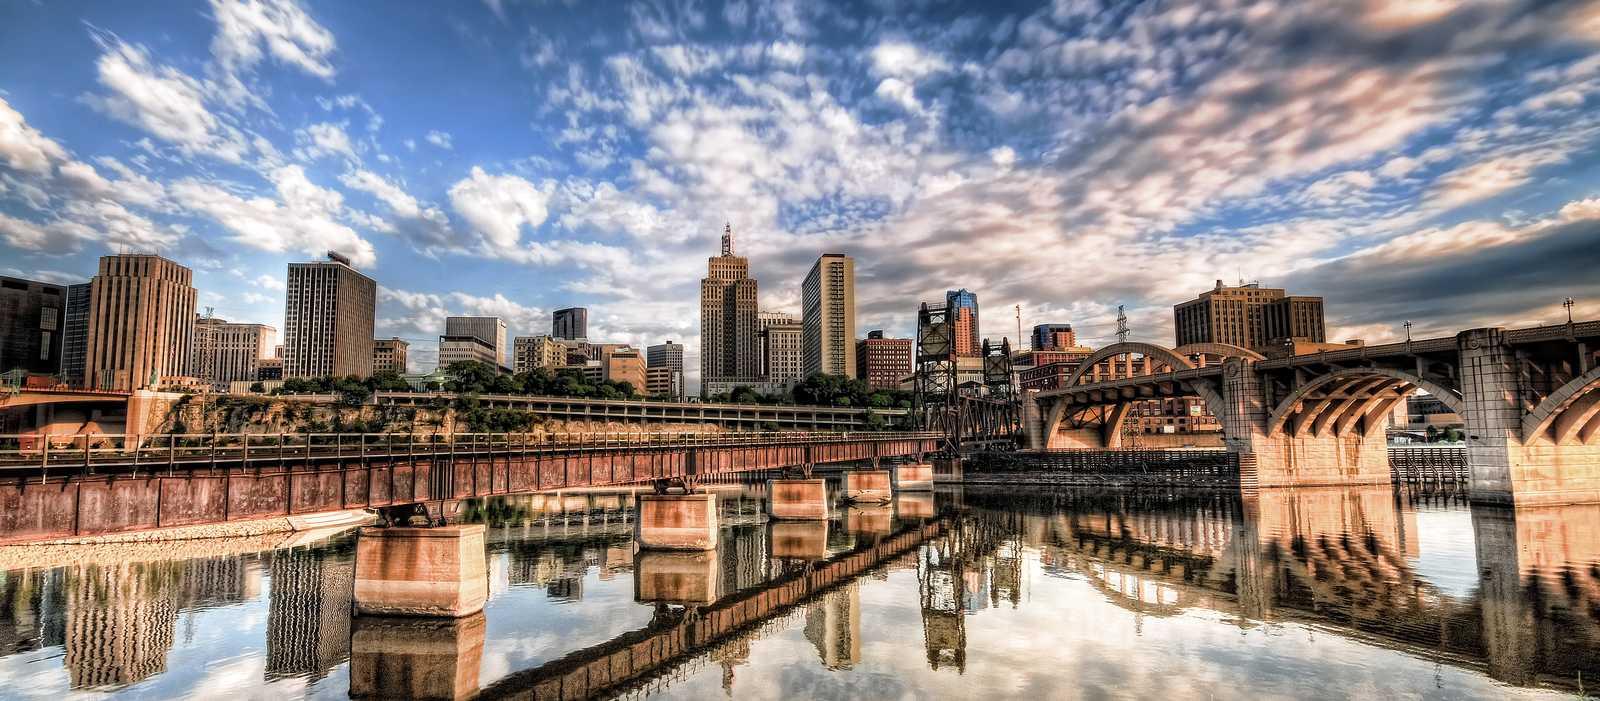 Skyline von St. Paul, Minnesota